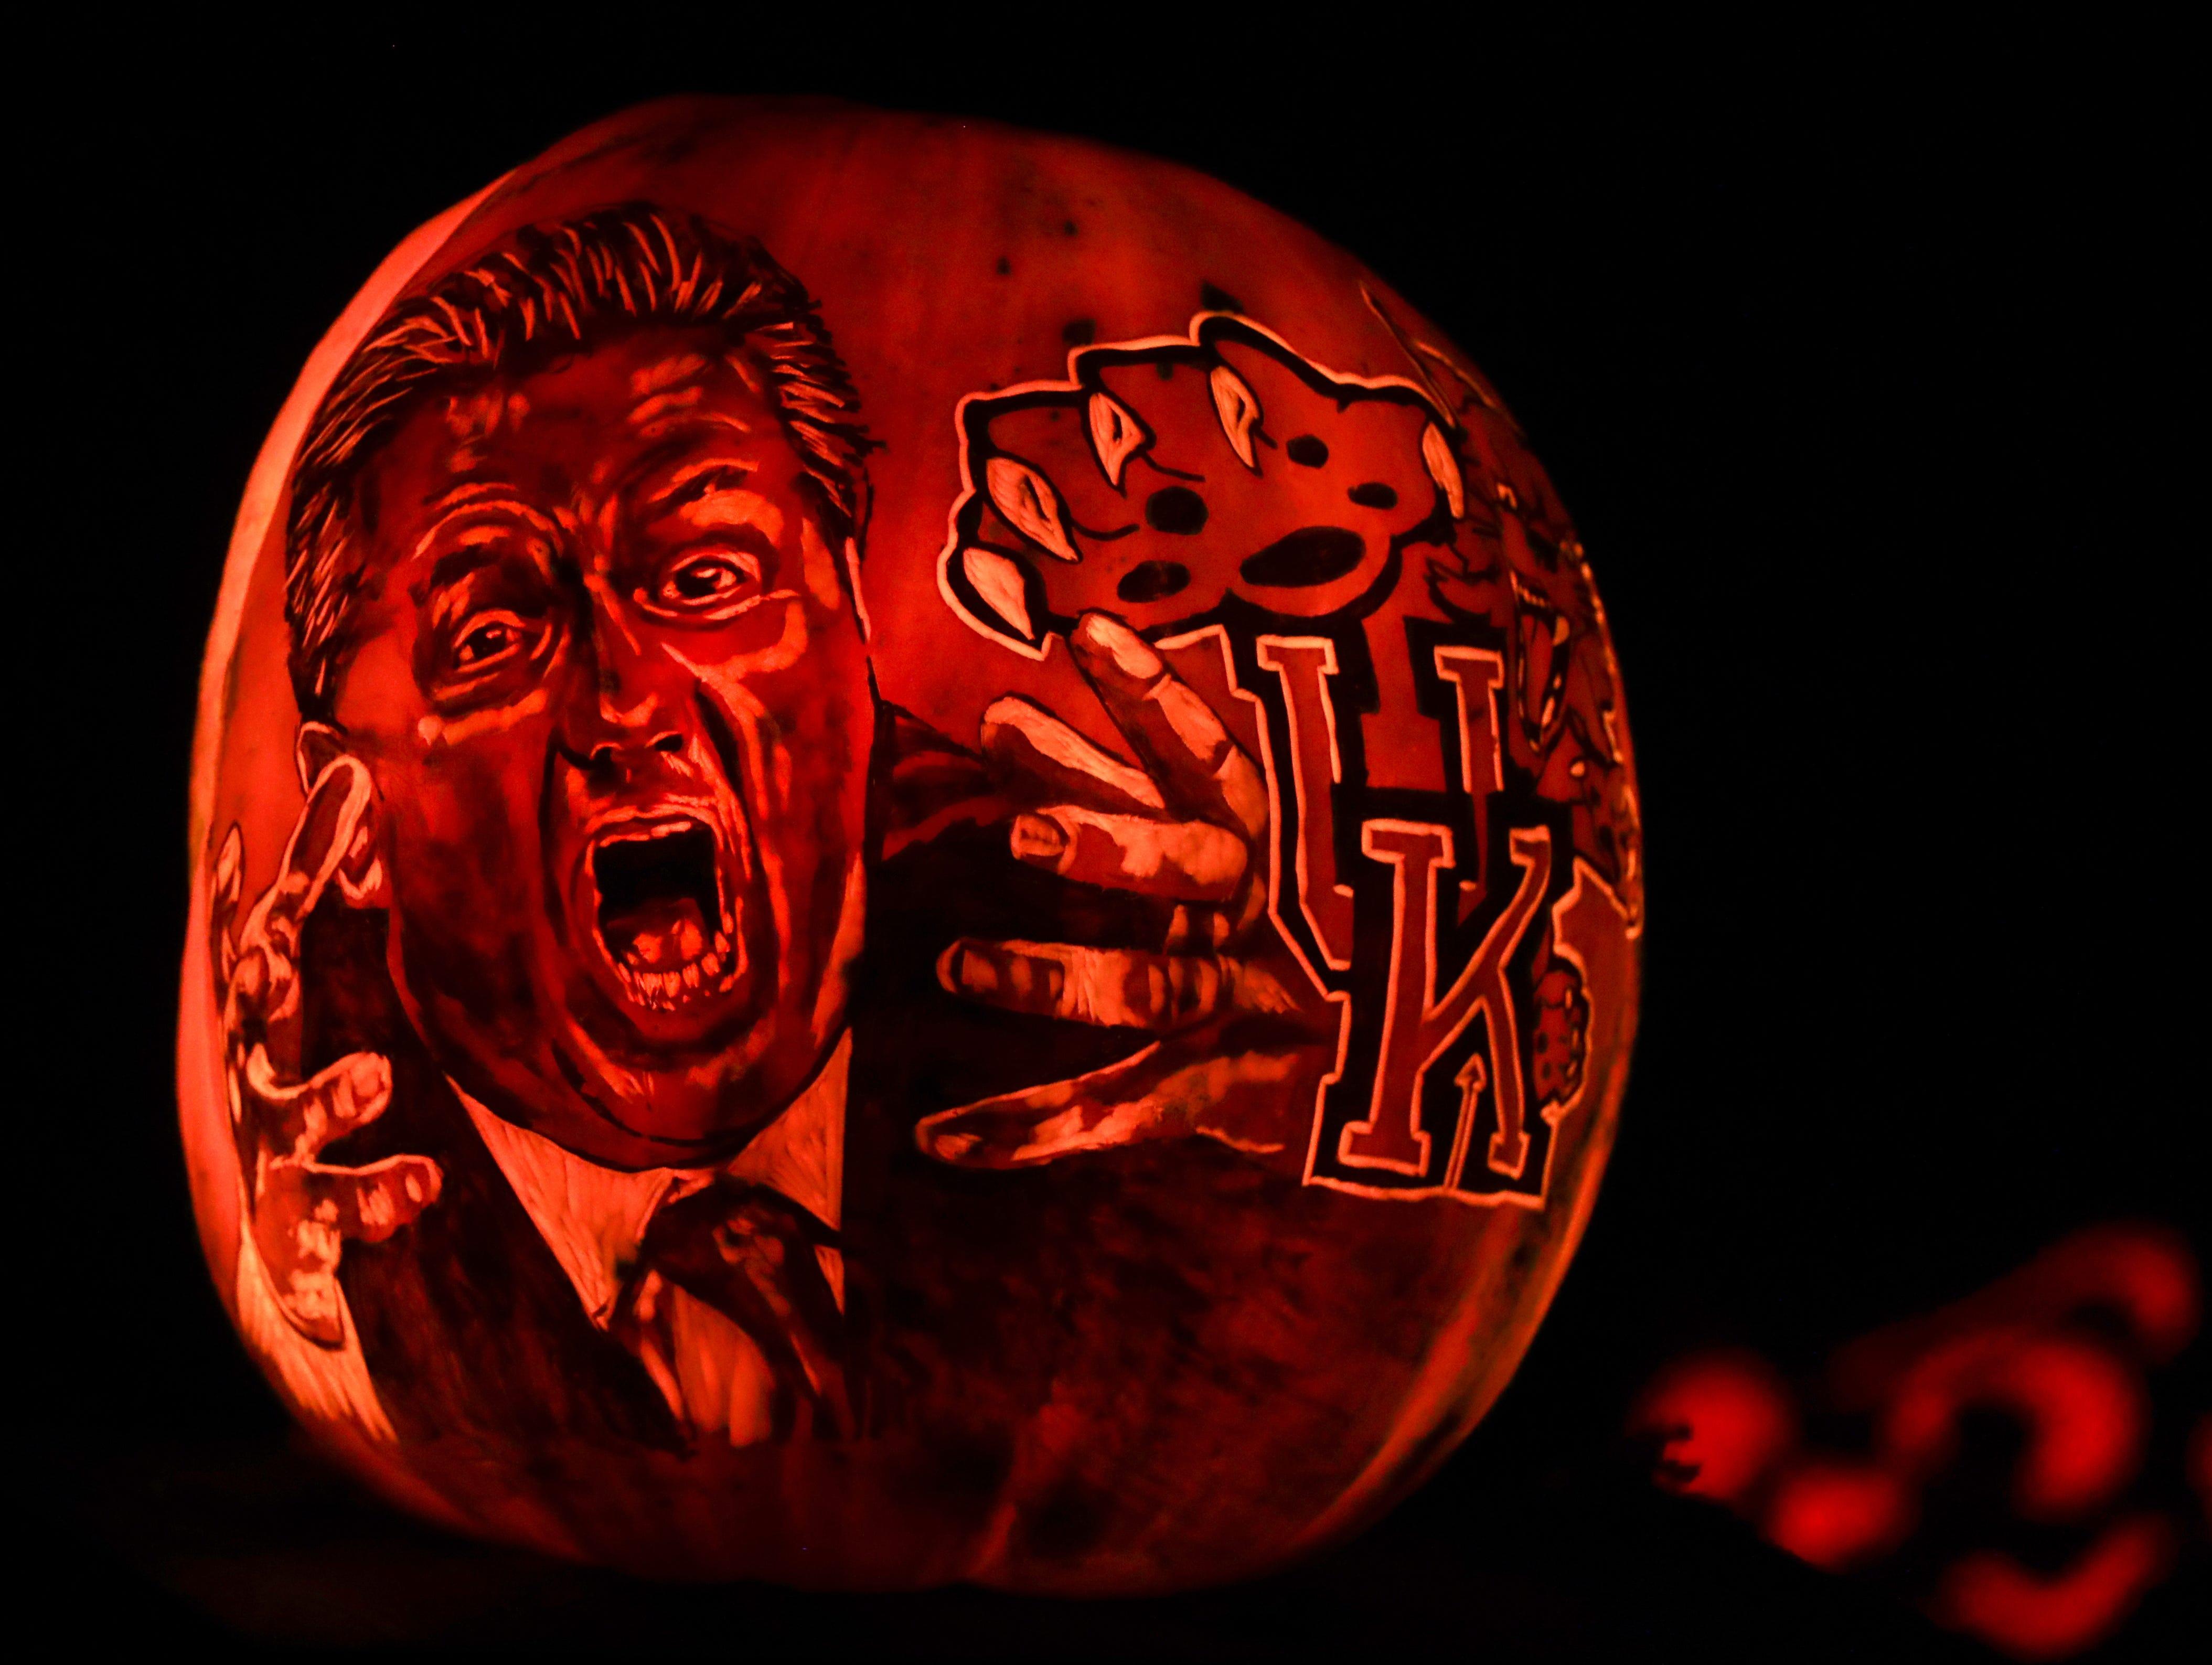 Kentucky's coach John Calipari appears on a pumpkin at this year's Jack O' Lantern Spectacular. Oct. 9, 2018